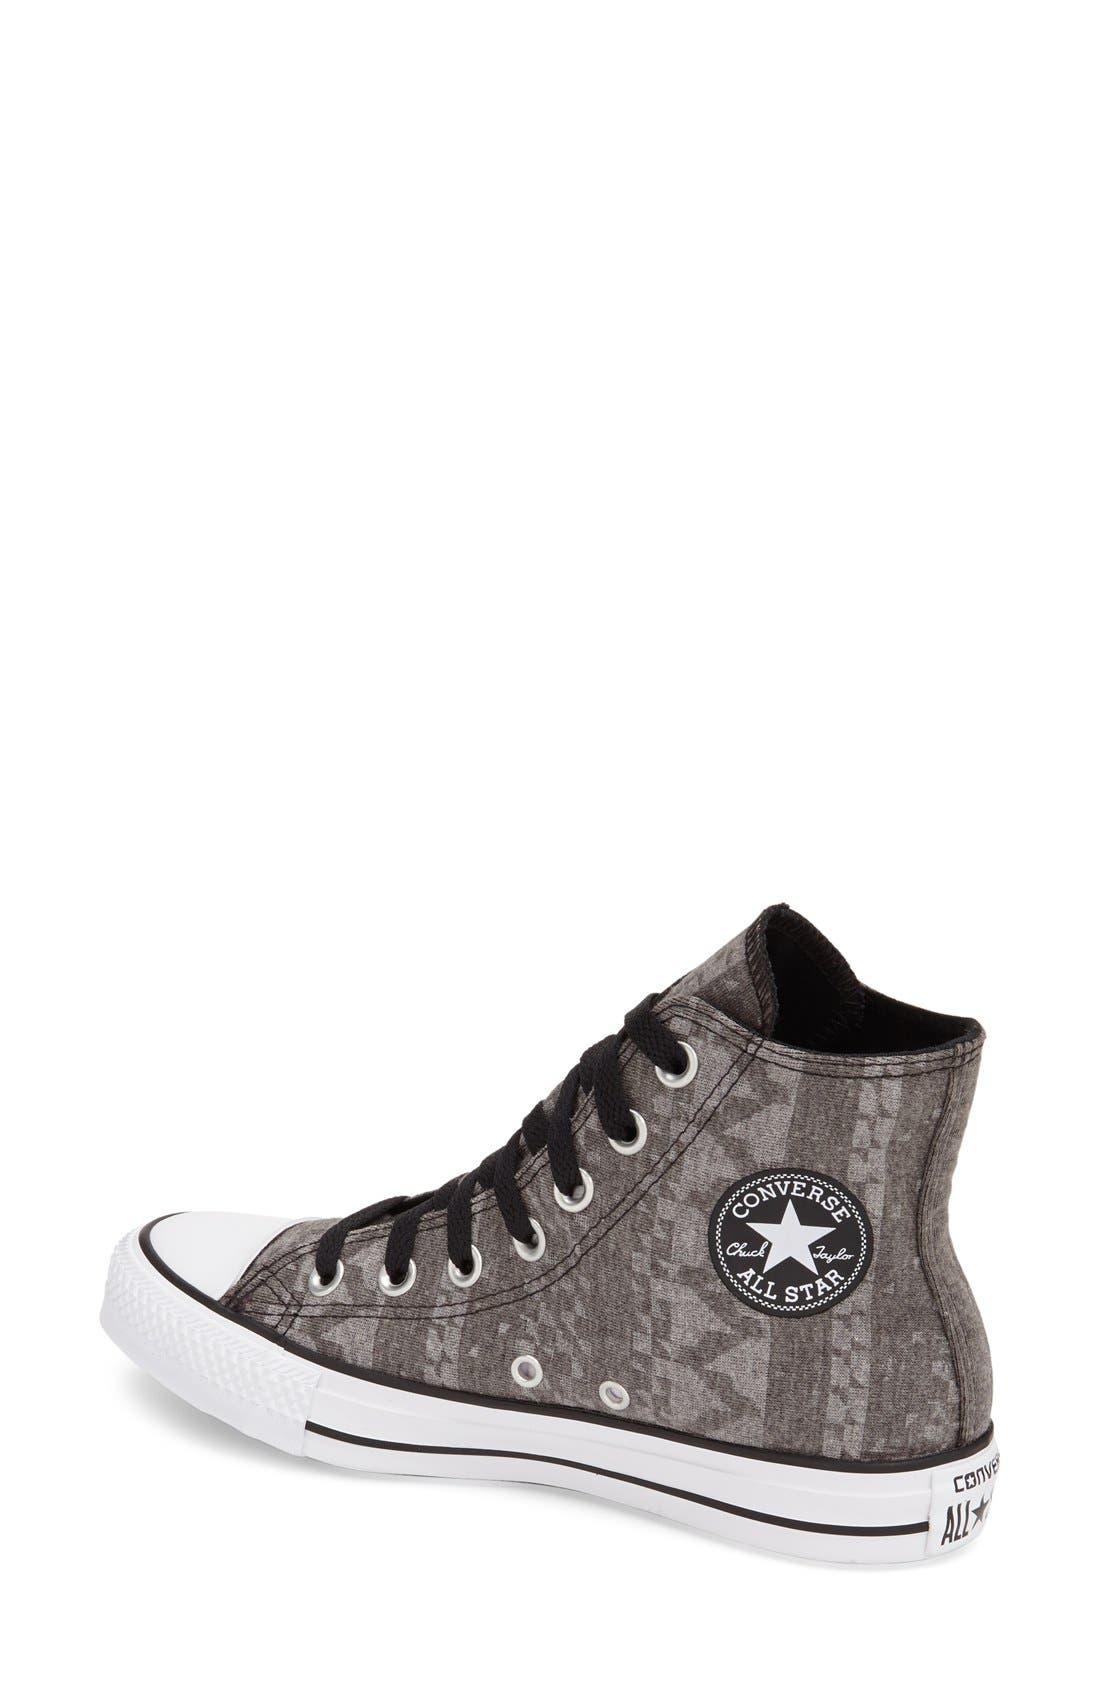 Alternate Image 2  - Converse Chuck Taylor® All Star® Geo Print High Top Sneaker (Women)